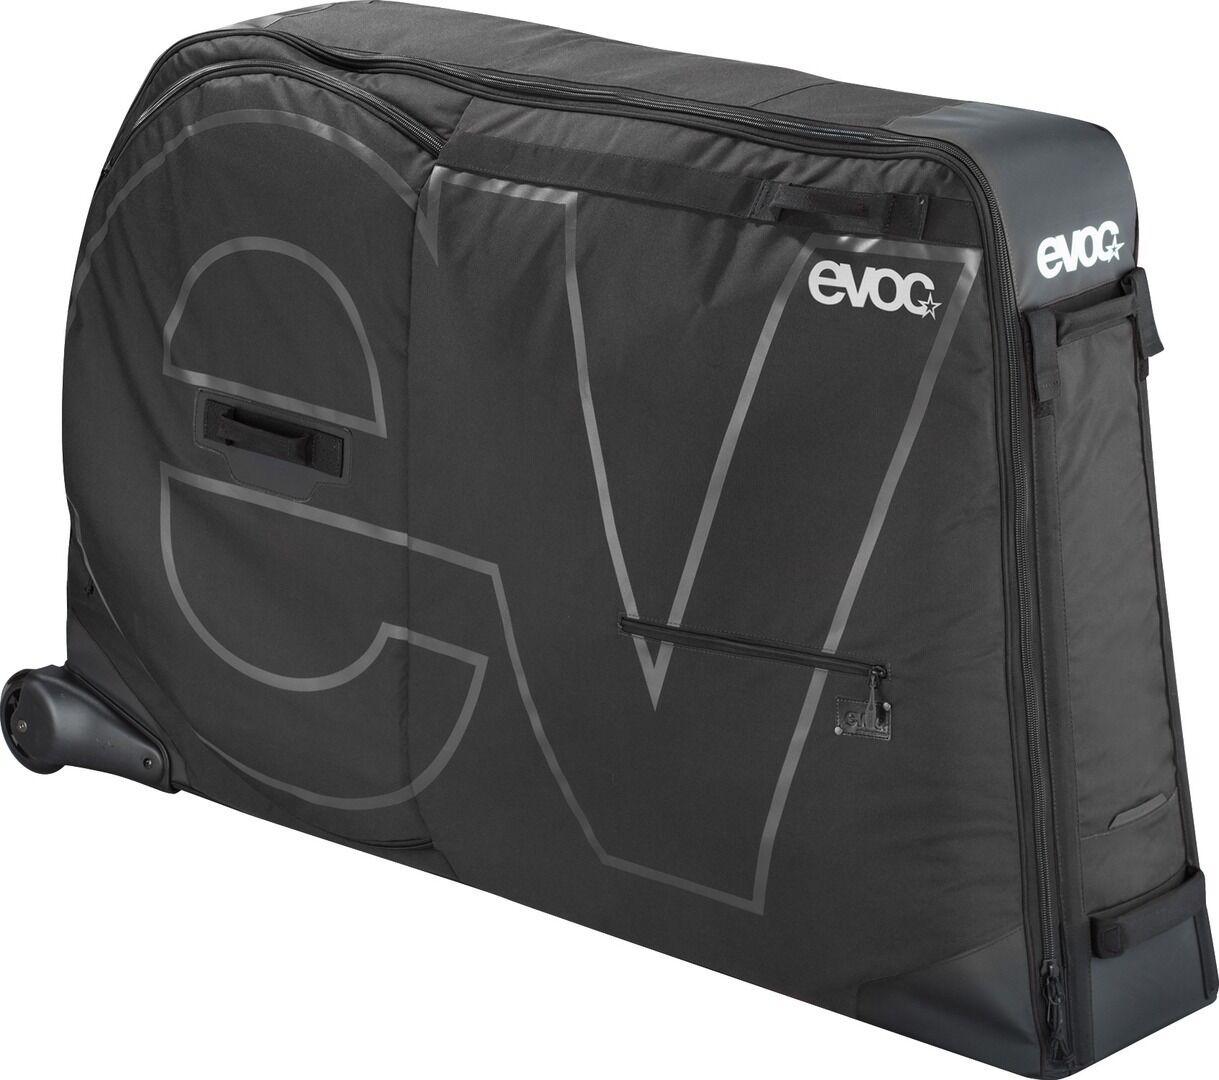 Evoc Bike Travel Bag 285L Black One Size